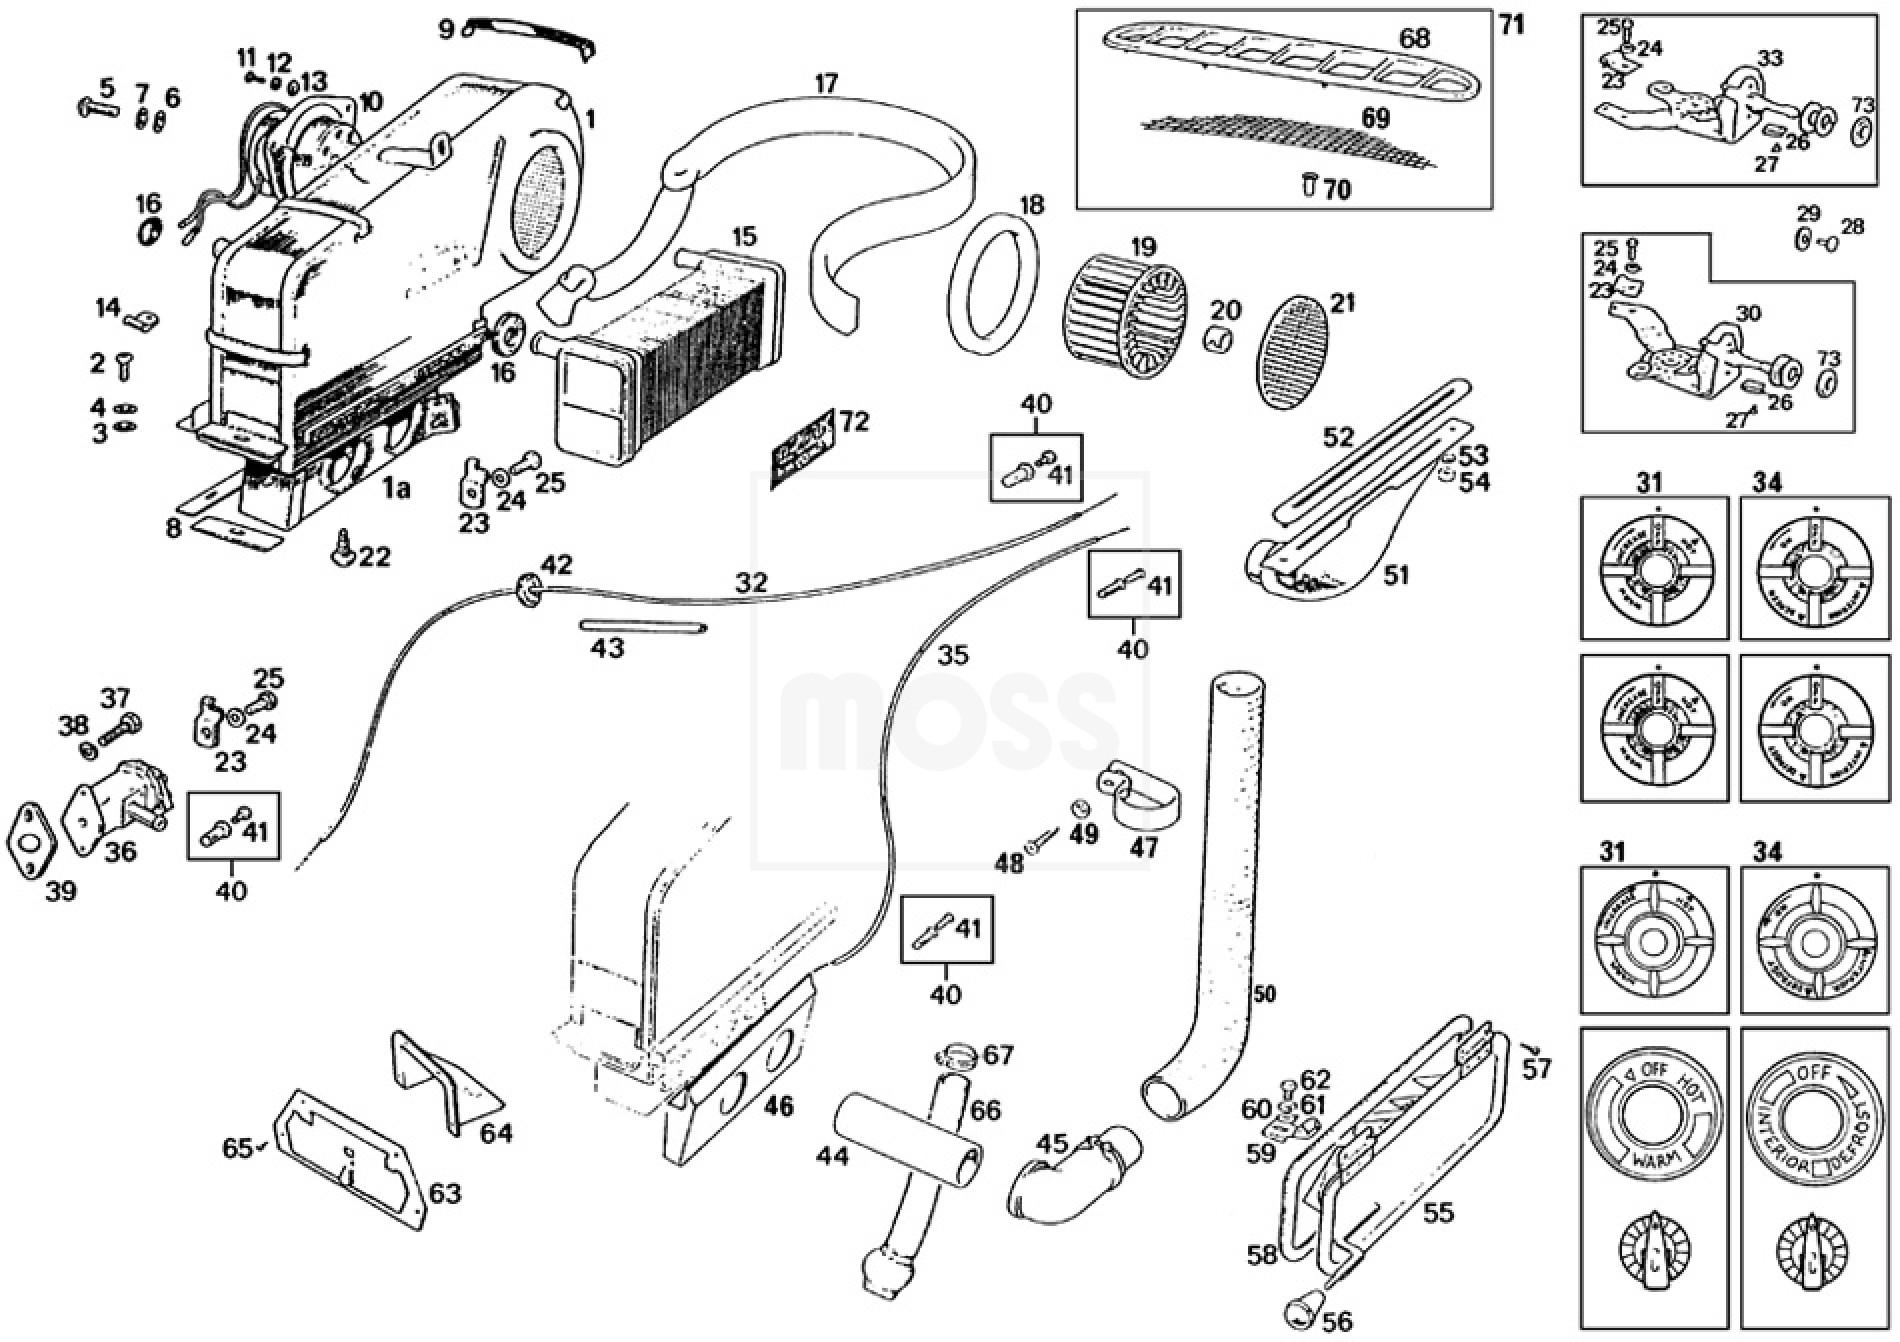 Heater Unit Amp Demister System